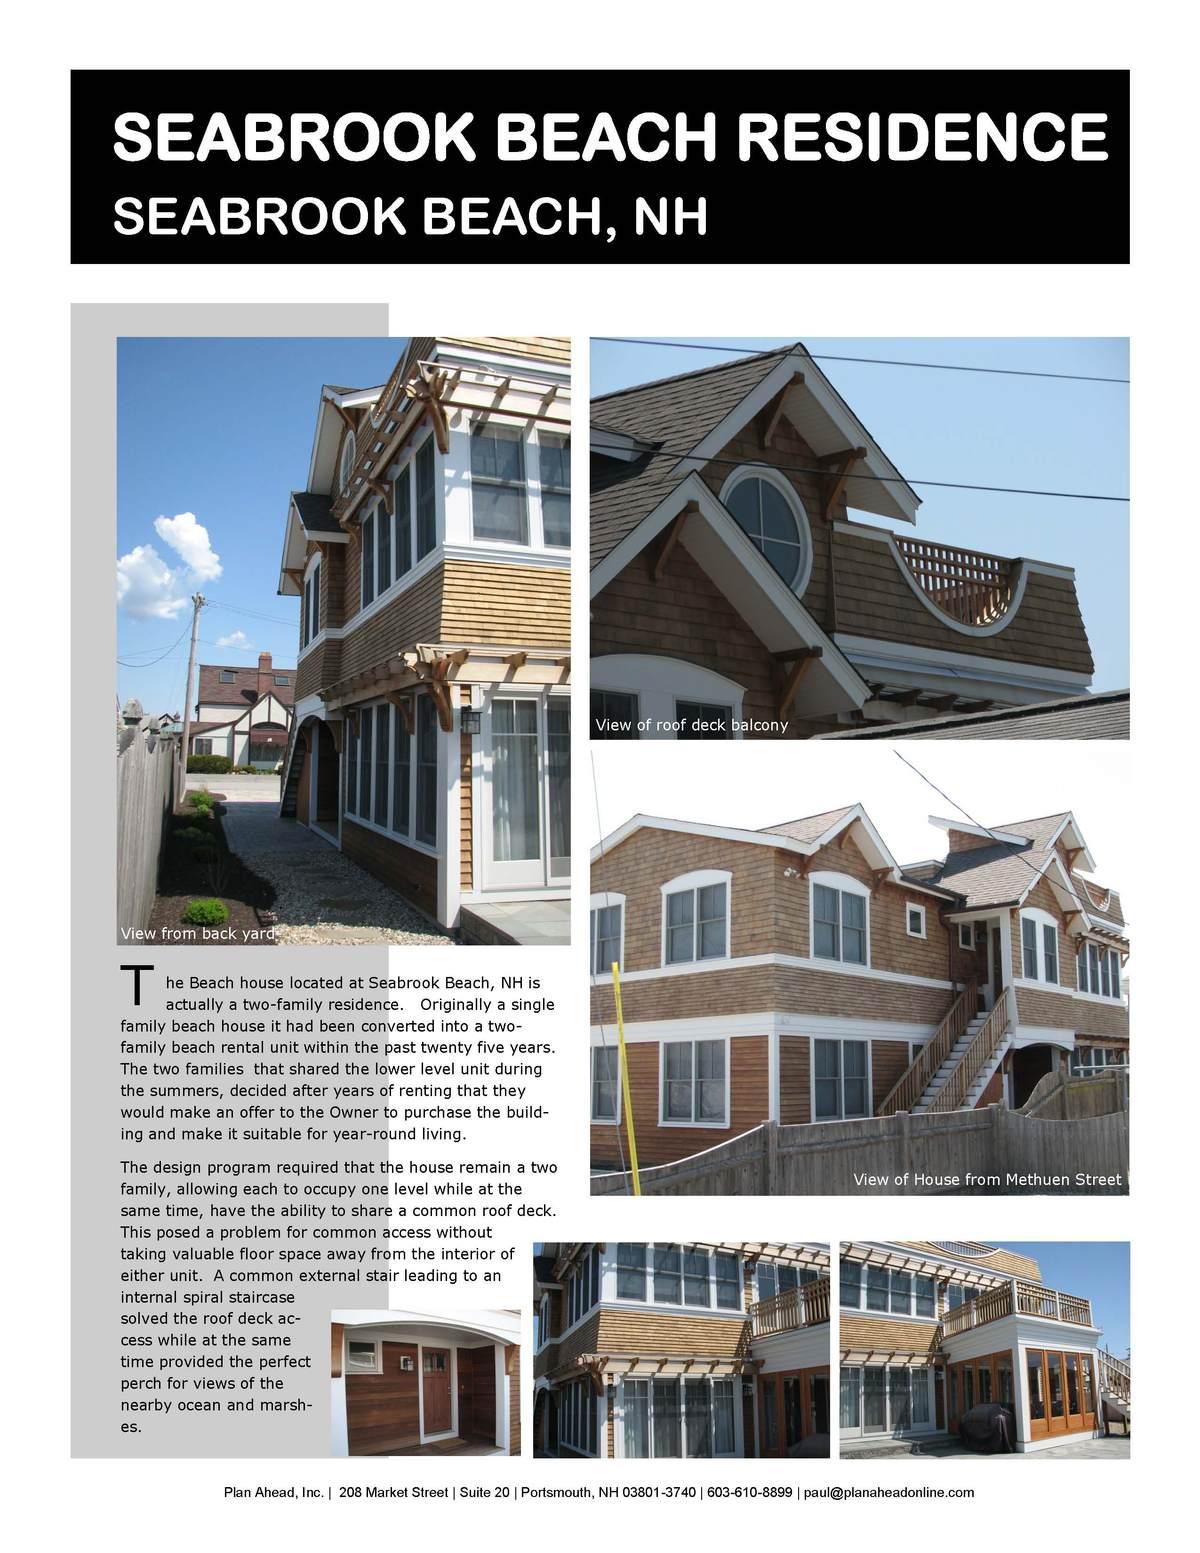 Seabrook Beach Residence